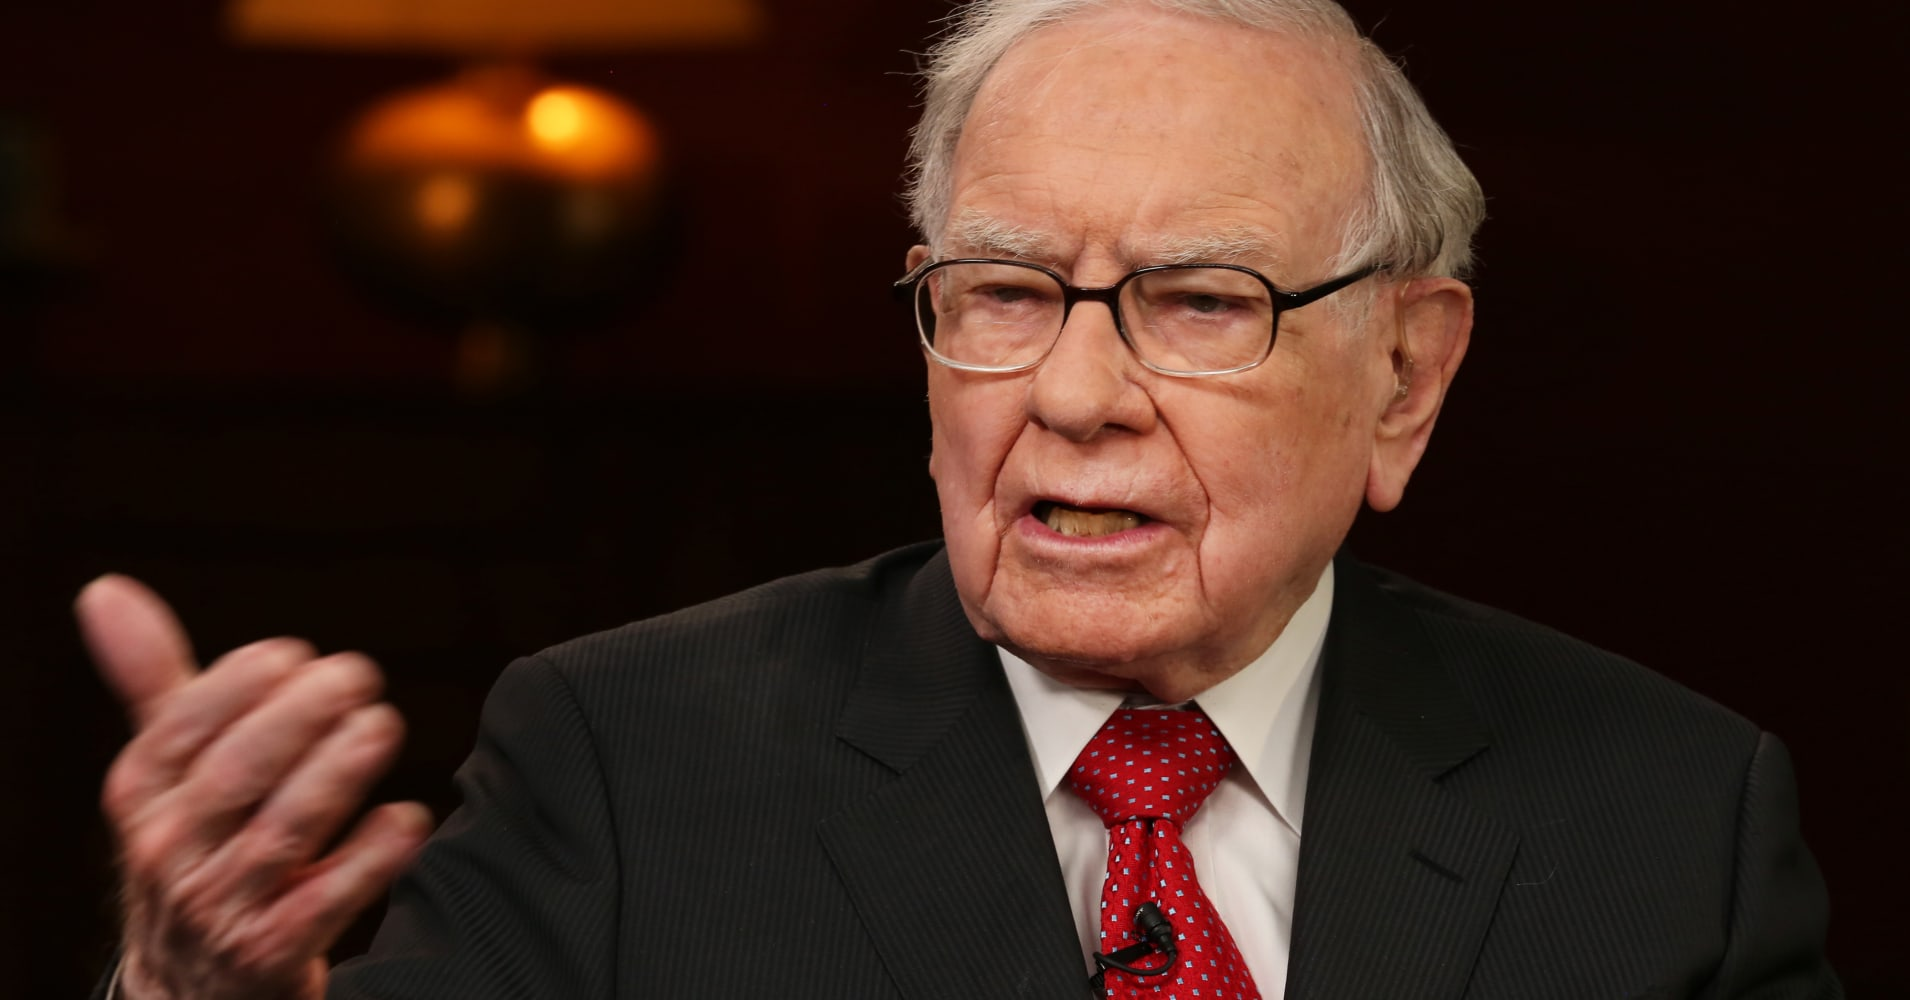 Warren Buffett Rejects Socialism, Calling Capitalism A